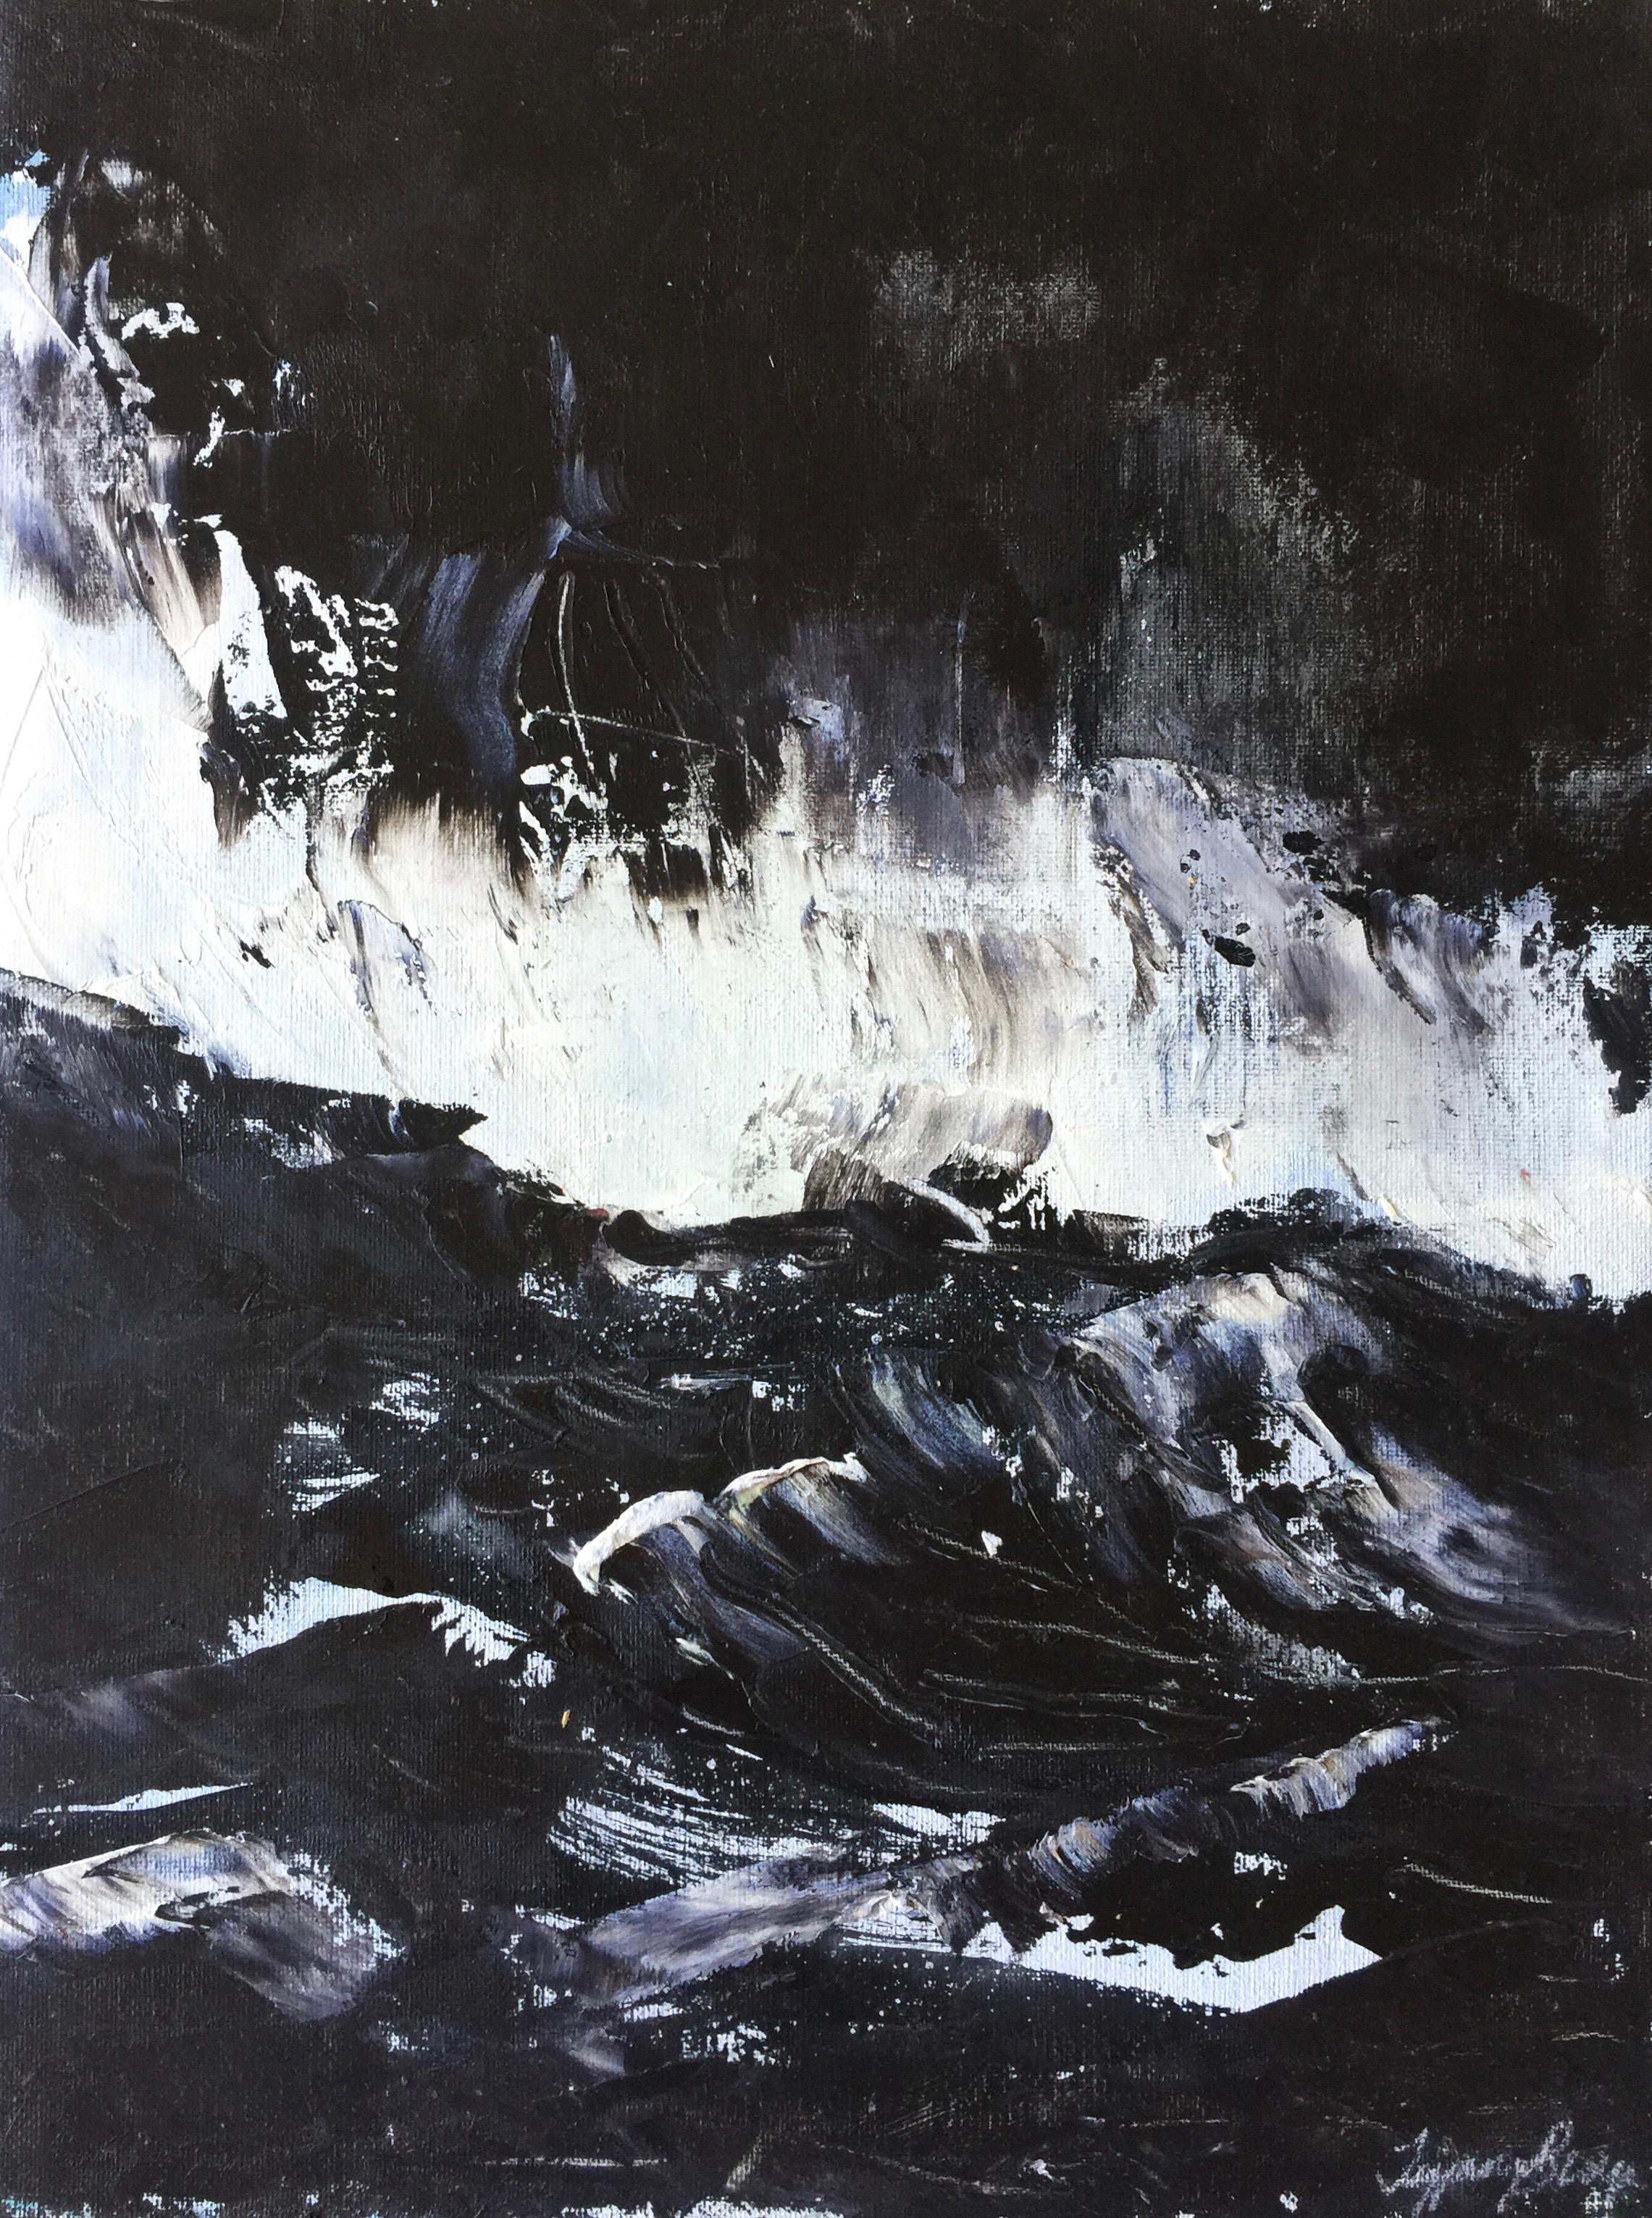 ASuddenStorm-SeaPower-9x12-TiffanyBlaise.jpg